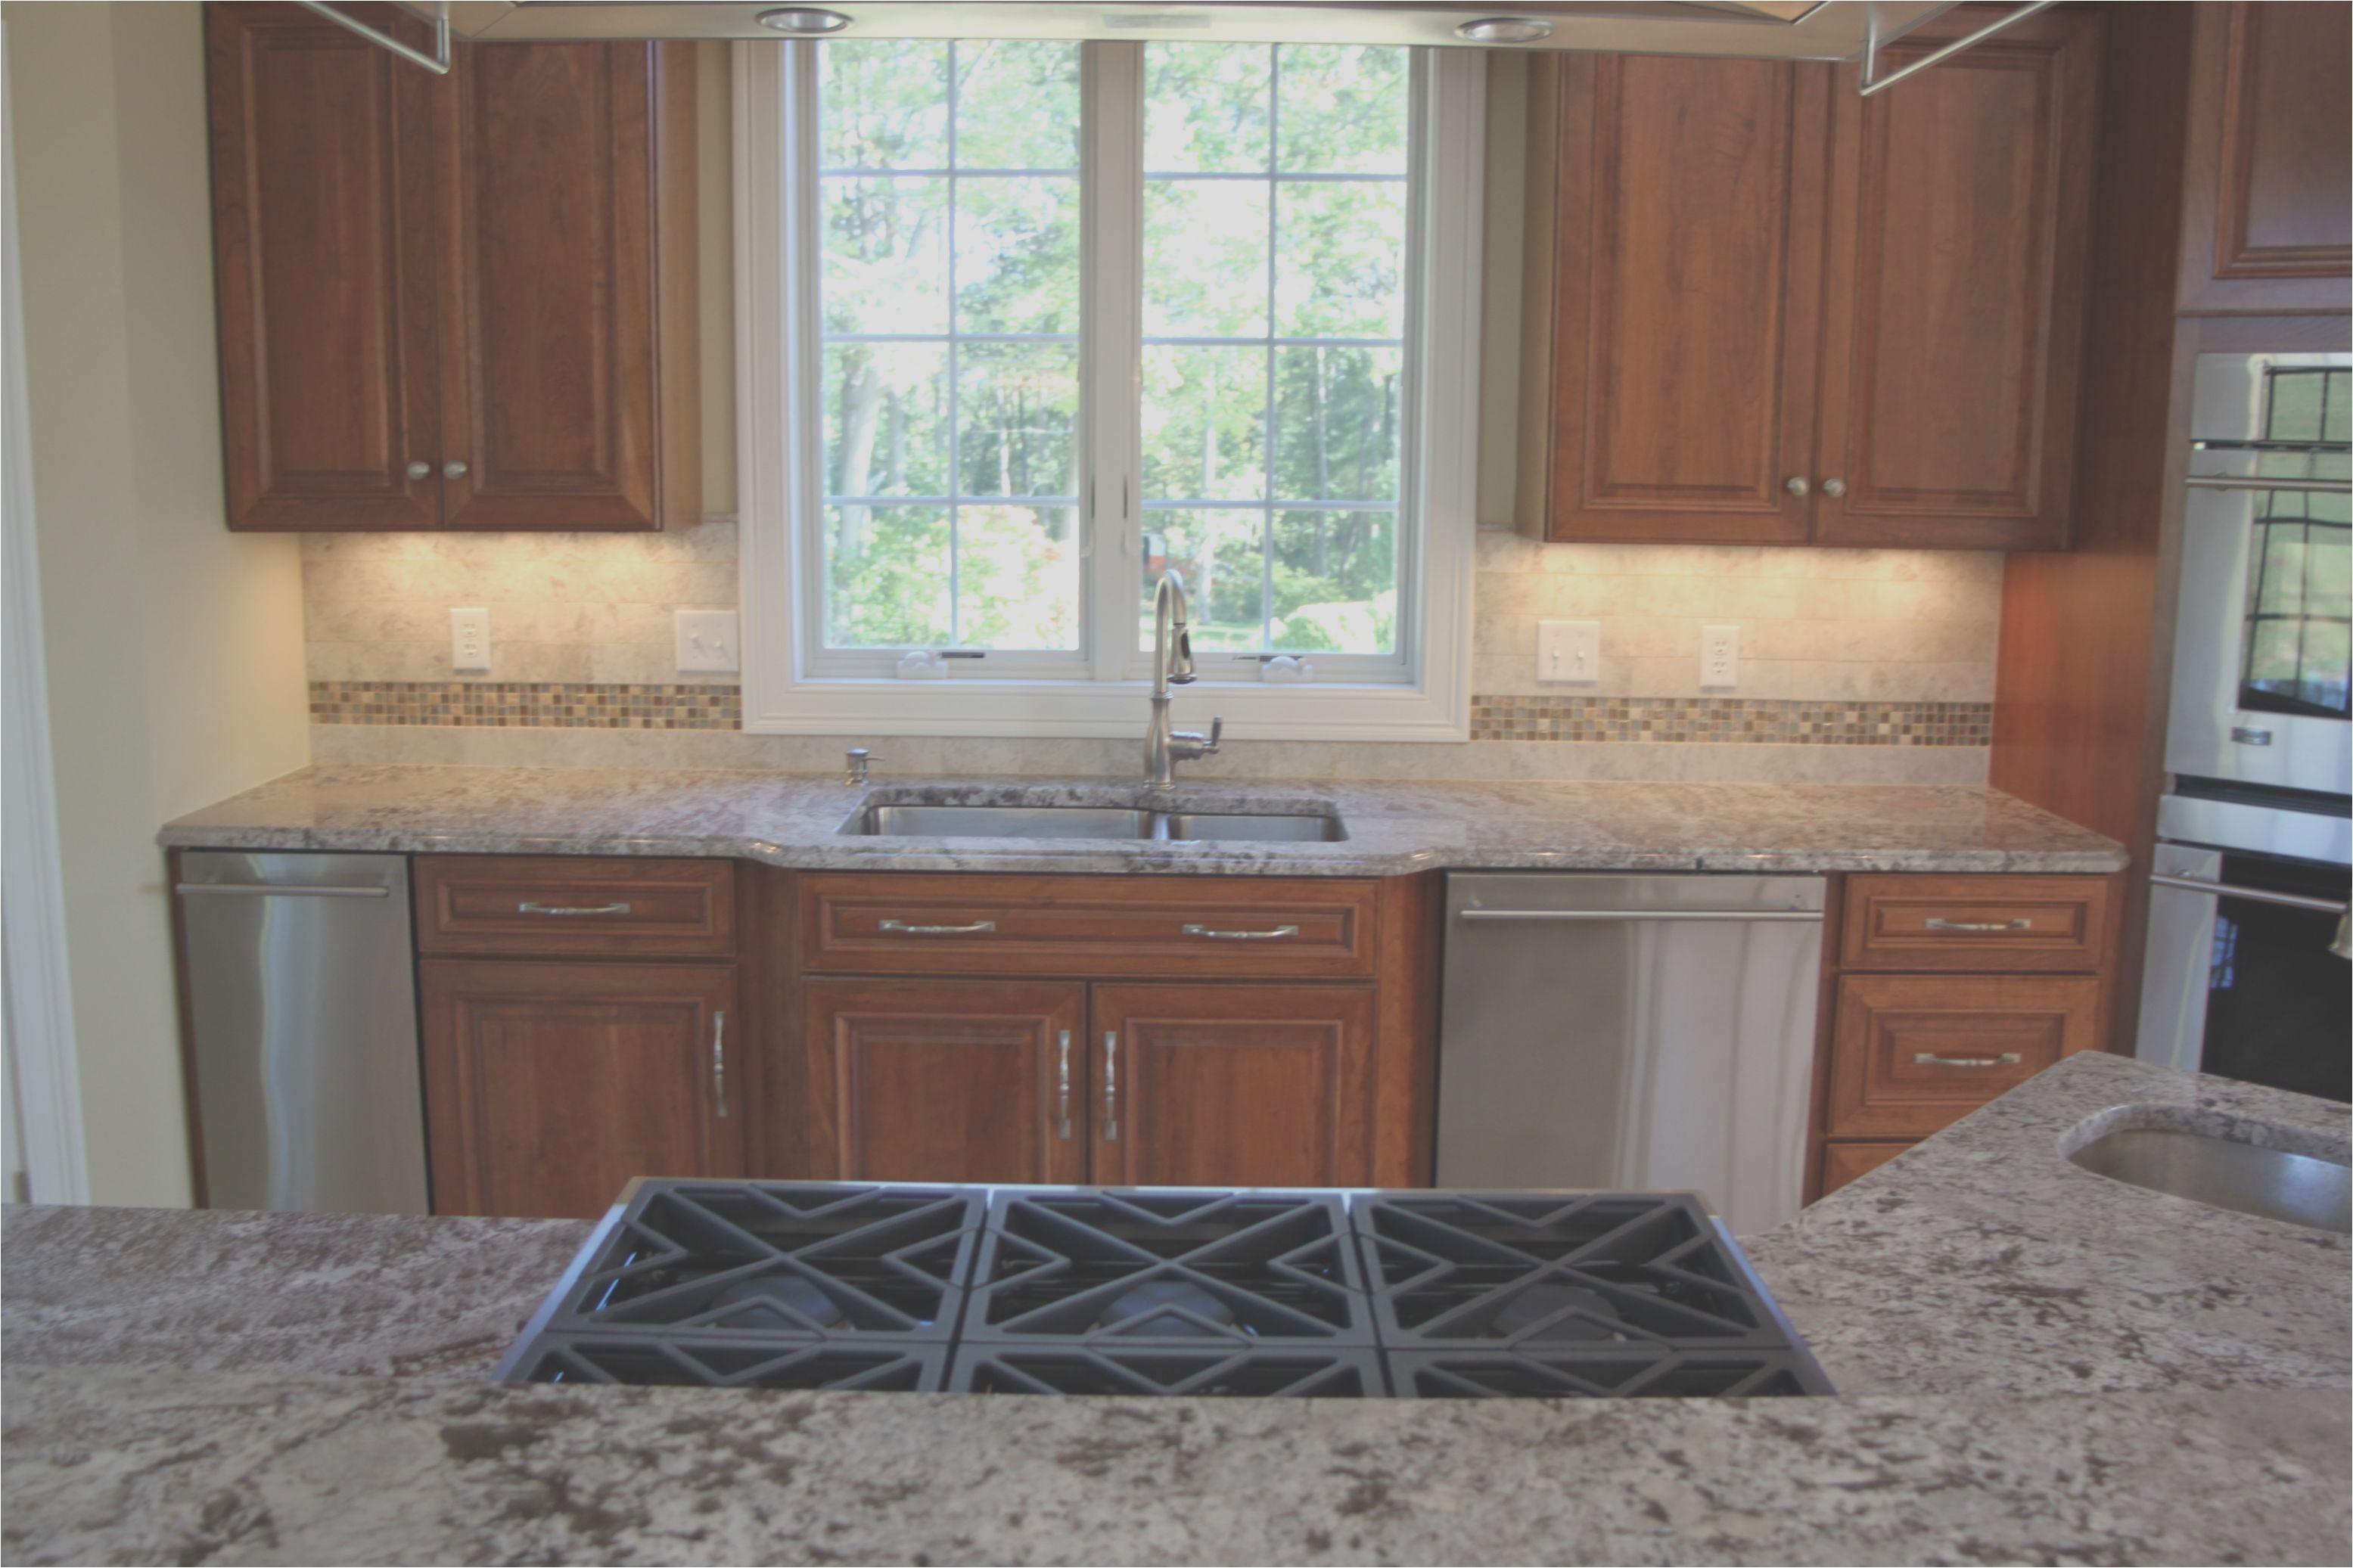 50 Exceptional Dark Wood Floors White Cabinets Trend Dark Wood